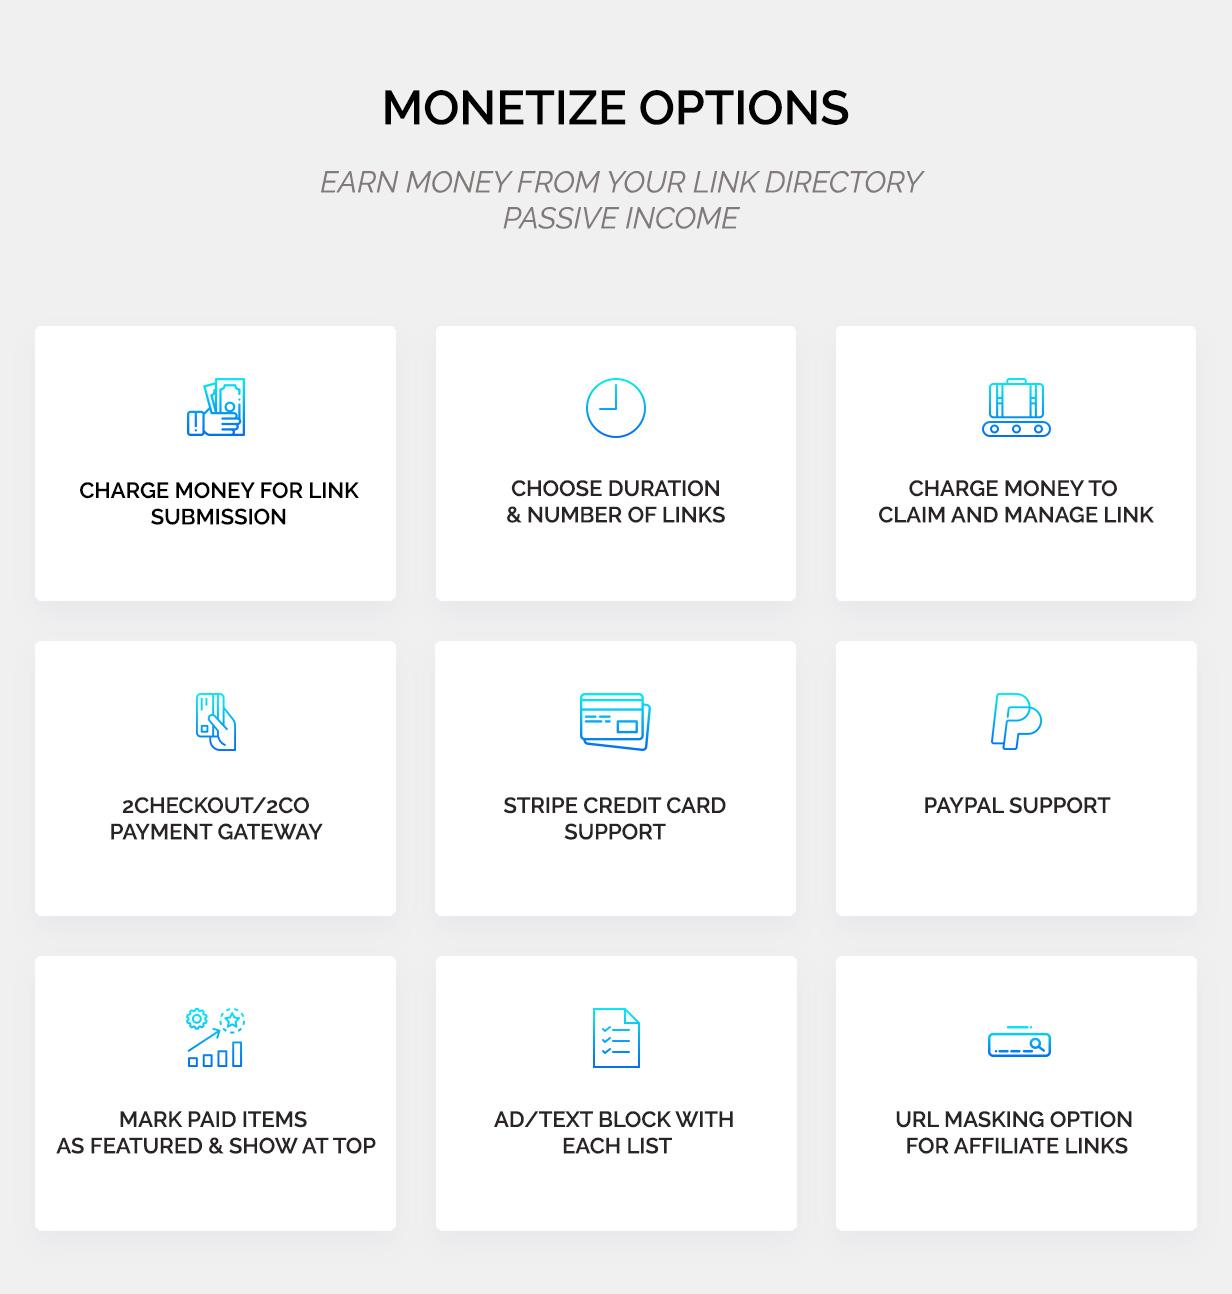 link-directory-monetize-option.jpg